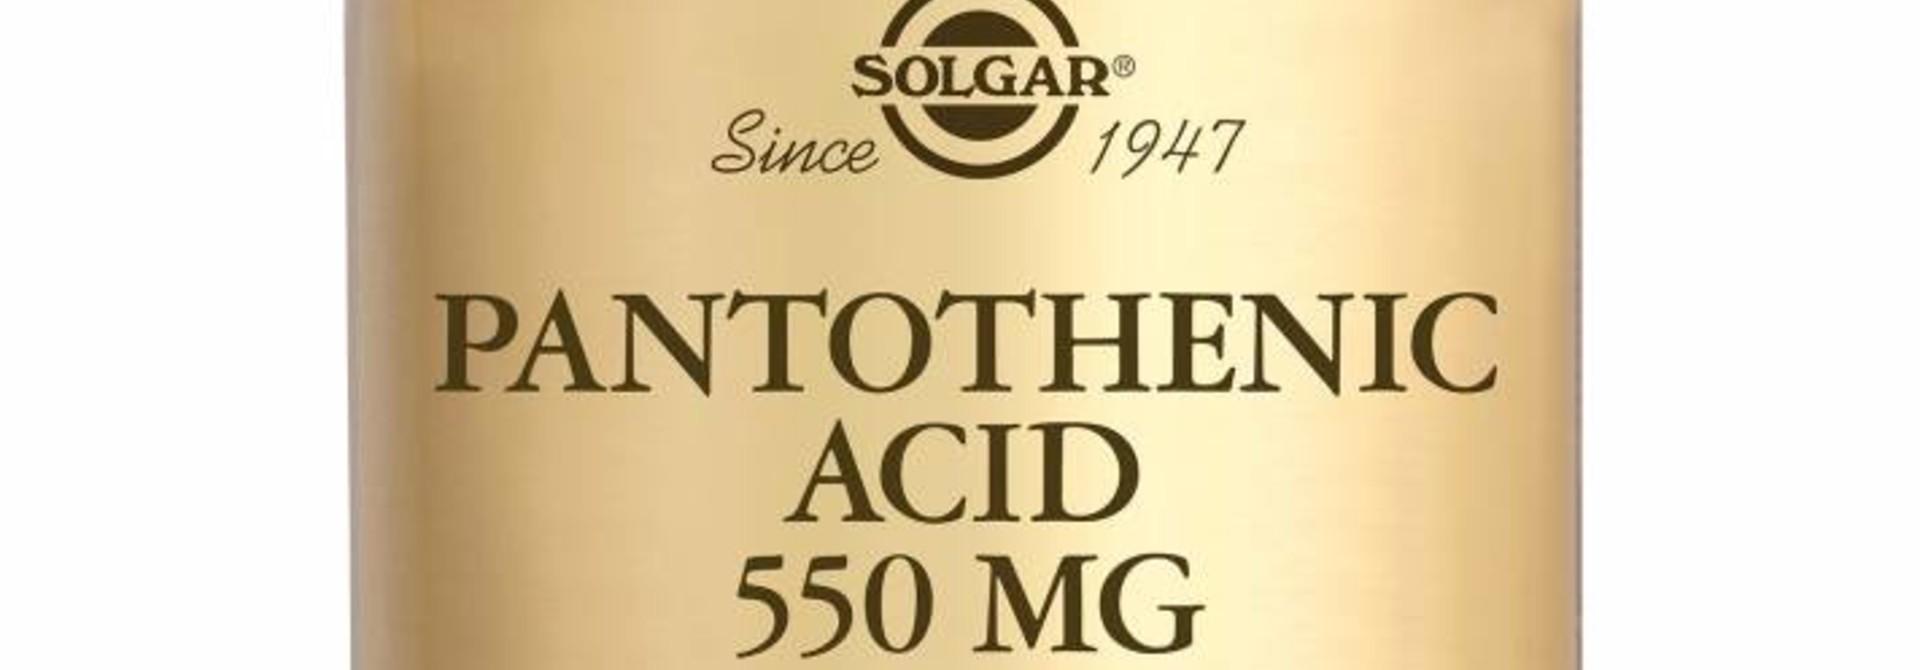 Pantothenic Acid 550 mg 50 plantaardige capsules